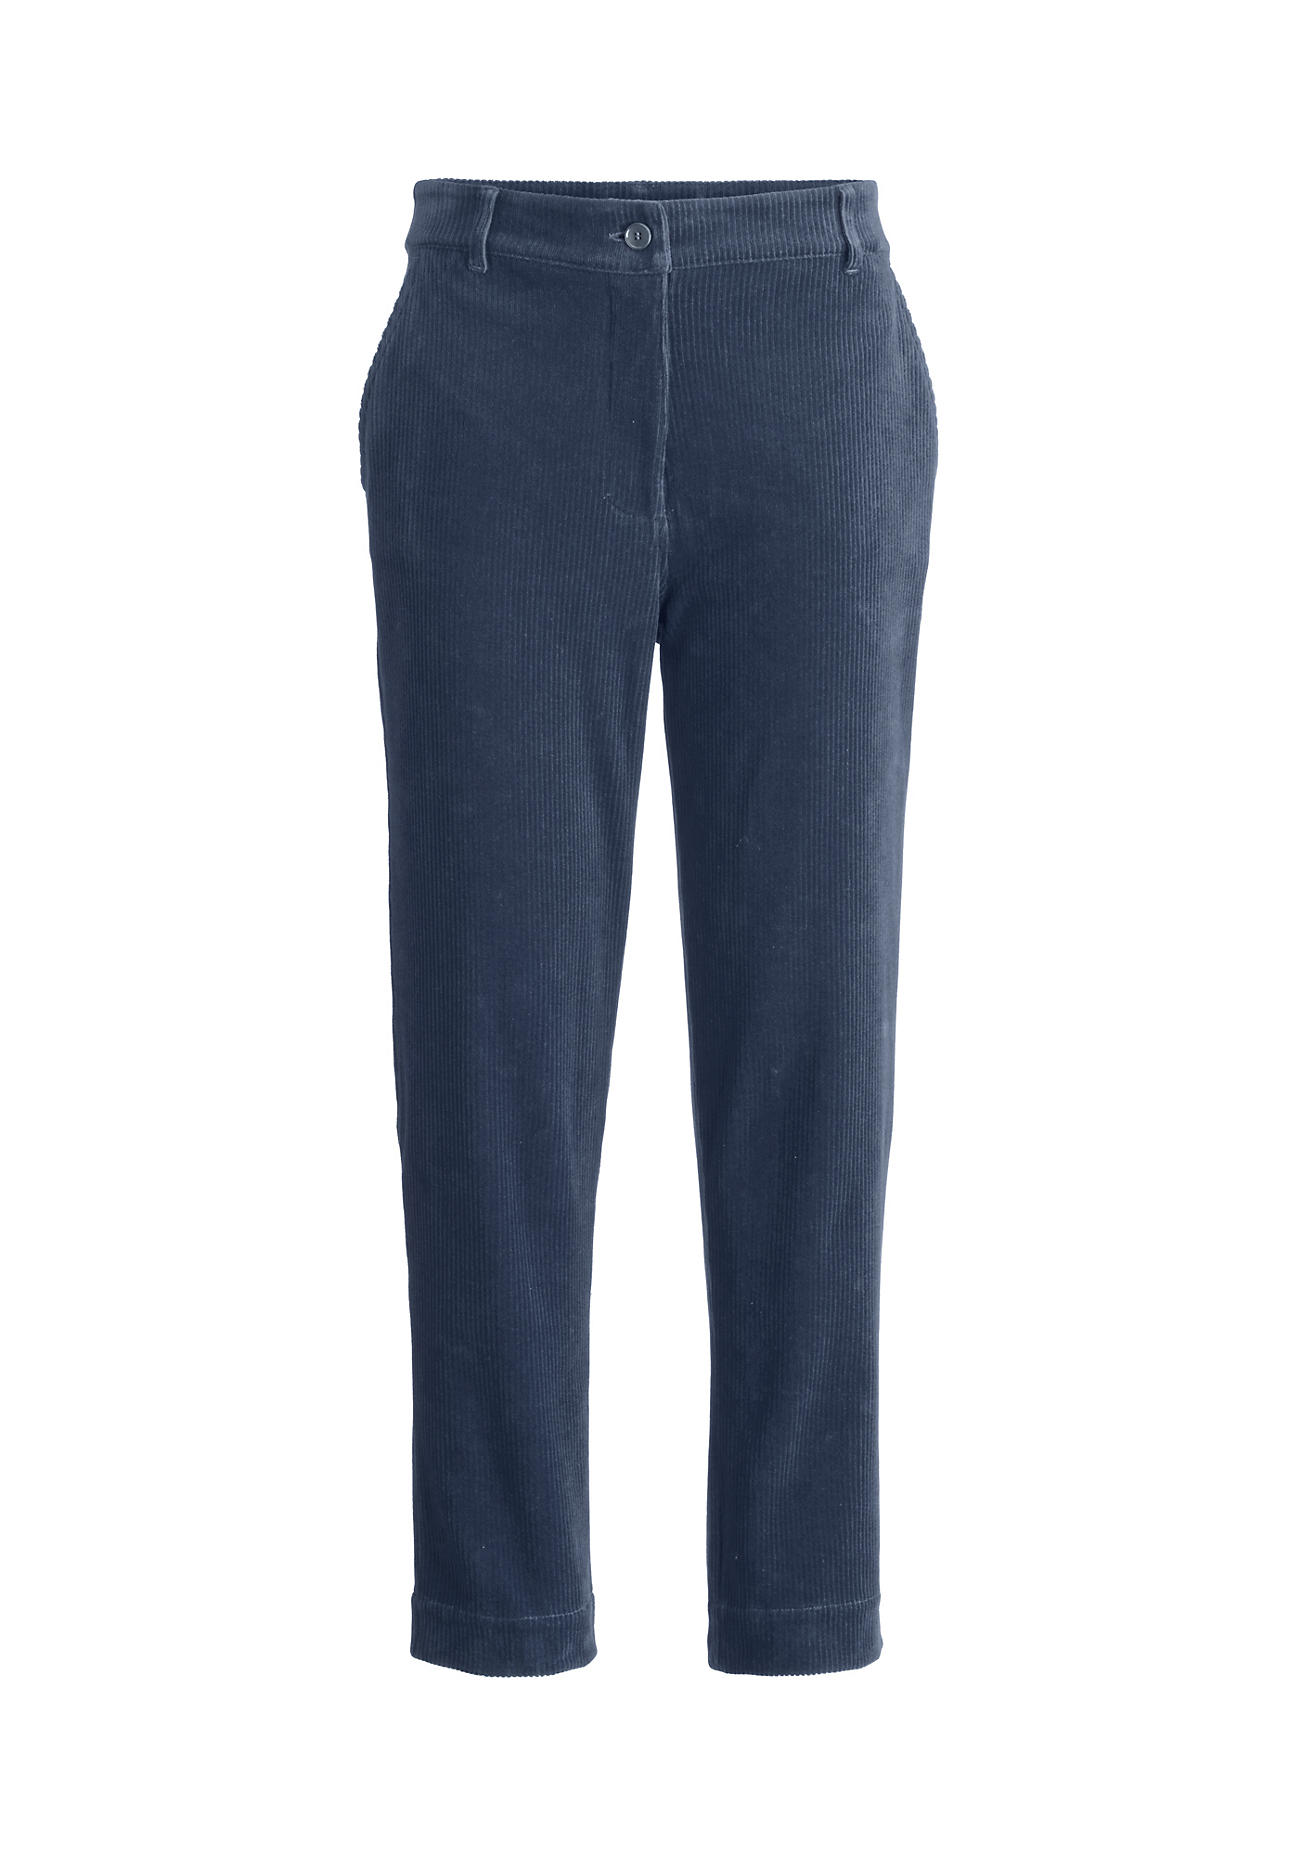 Hosen - hessnatur Damen Cord Hose aus Bio Baumwolle – blau –  - Onlineshop Hessnatur